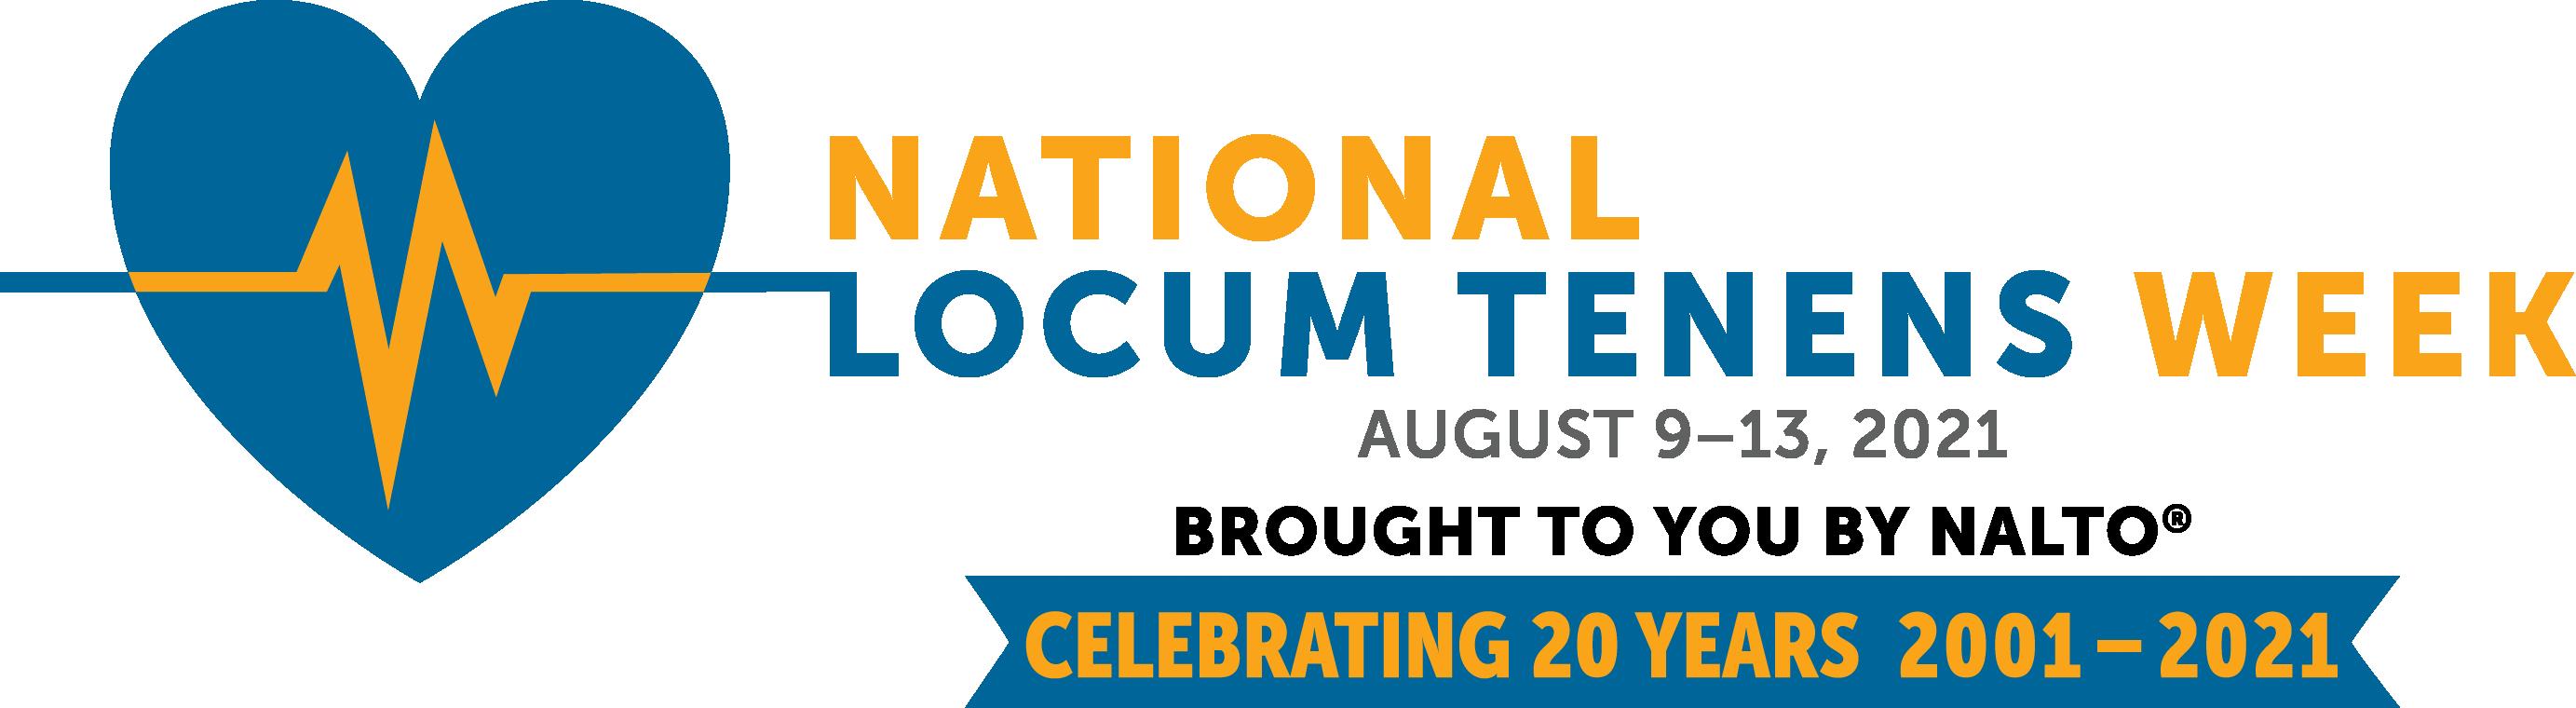 2021 National Locum Tenens Week